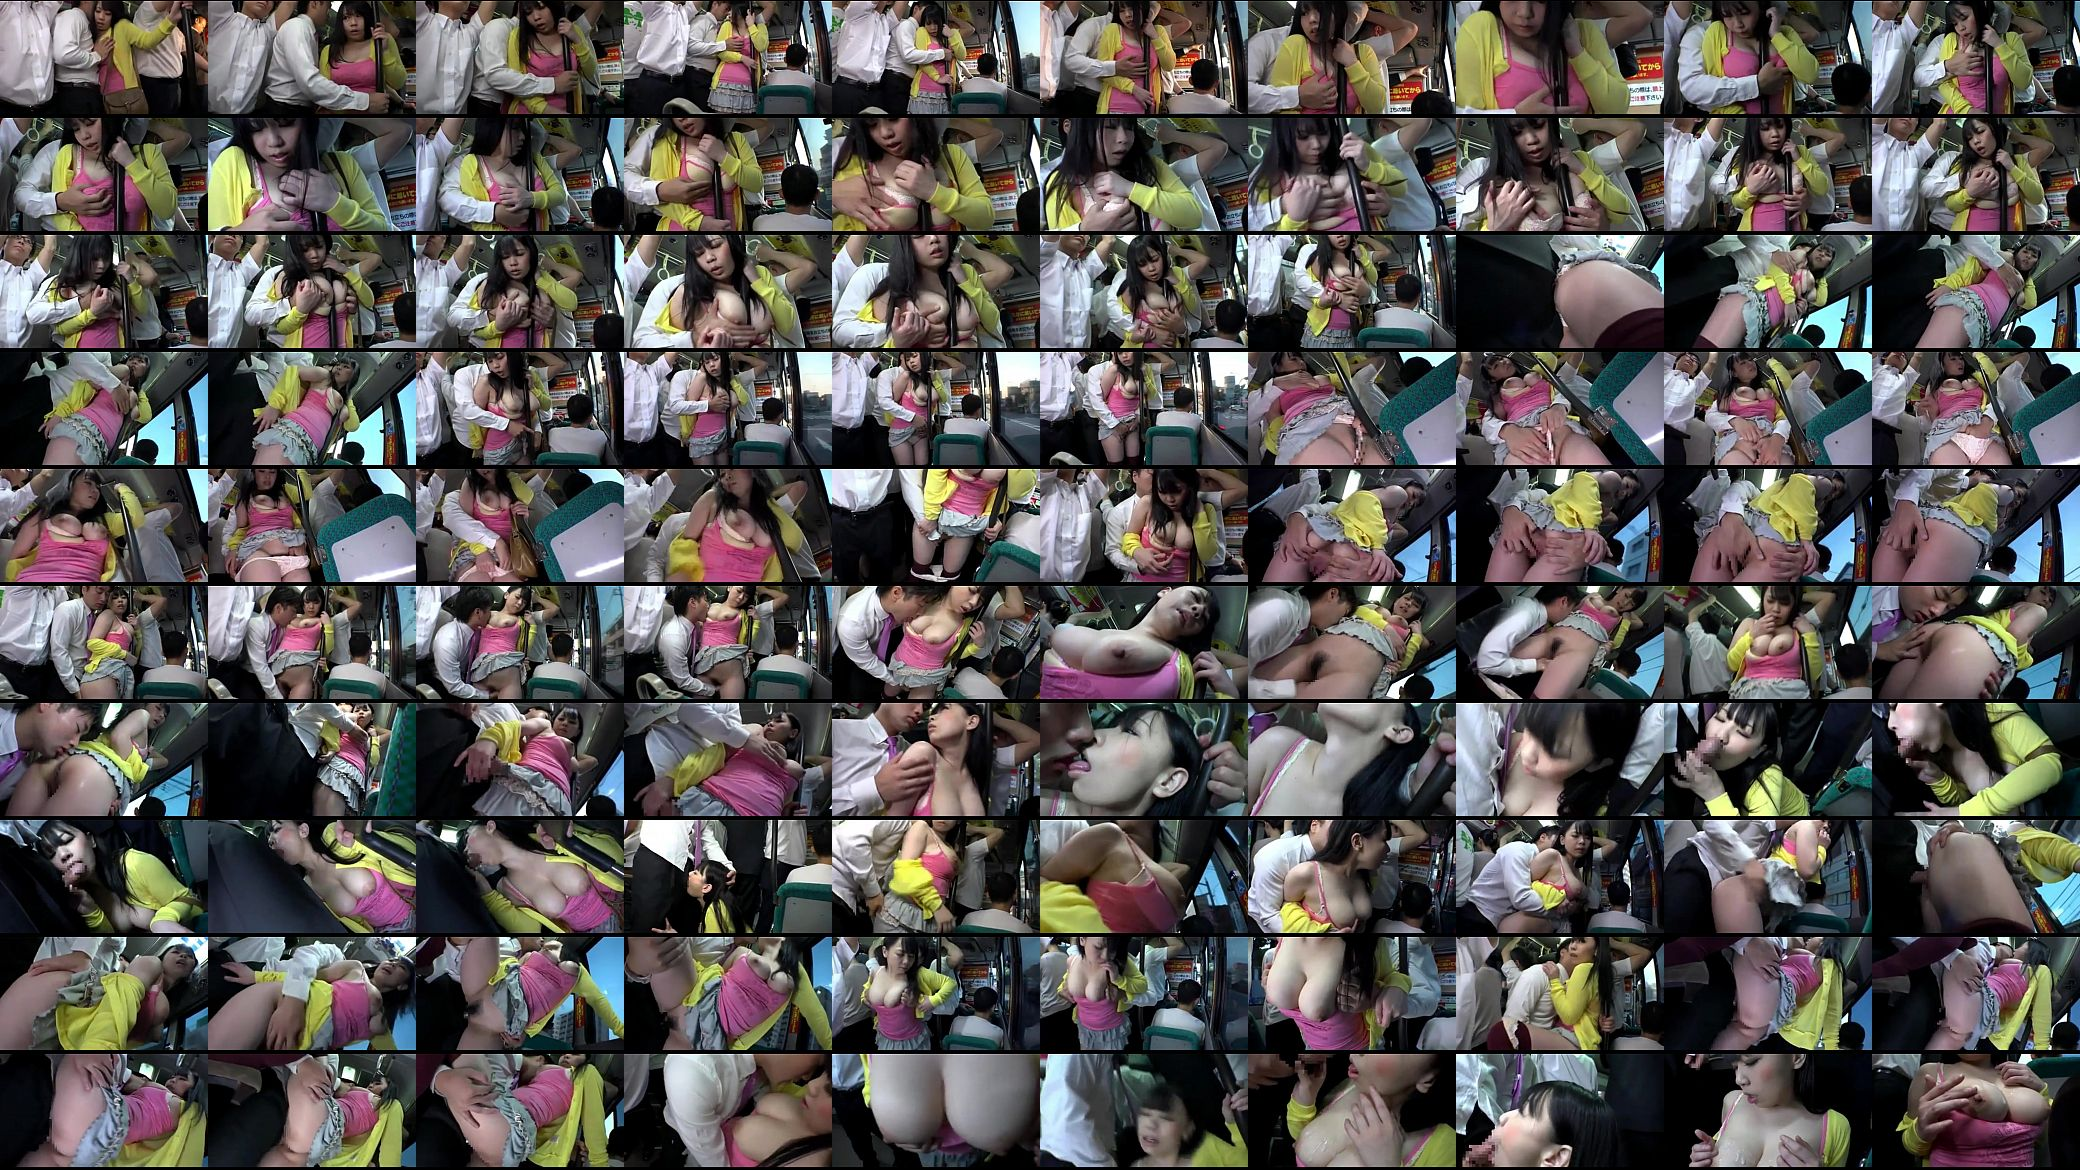 Abusada En Bus India Porno japanese women groped/fucked on the bus - xnxx